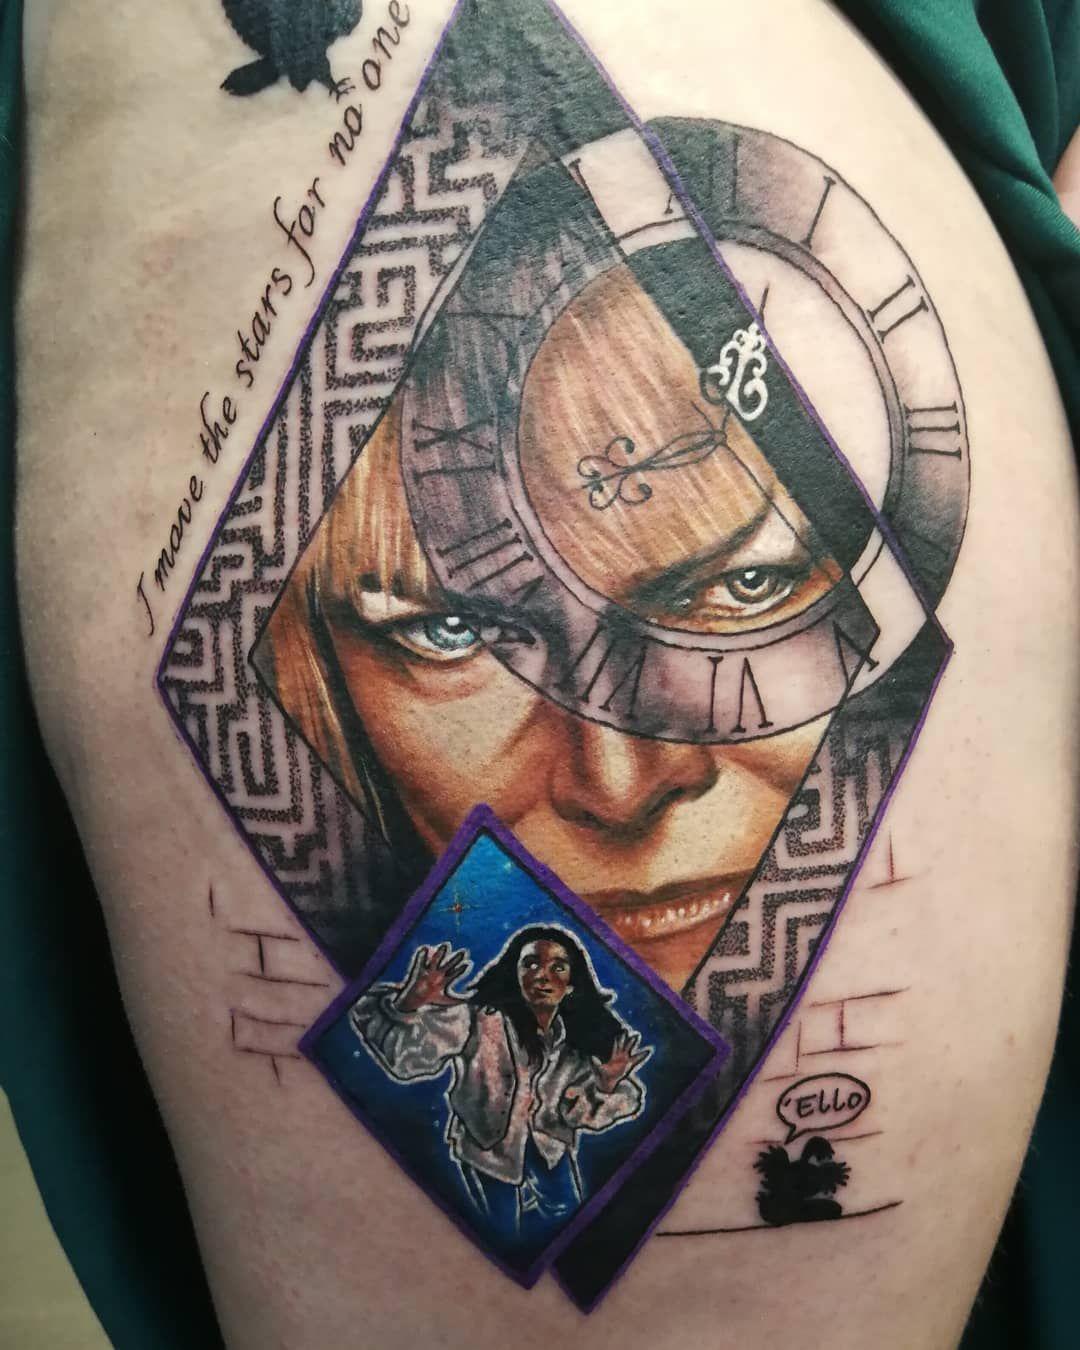 Labyrinth Movie Tattoo Ideas In 2020 Labyrinth Tattoo Labrynth Tattoo Movie Tattoo